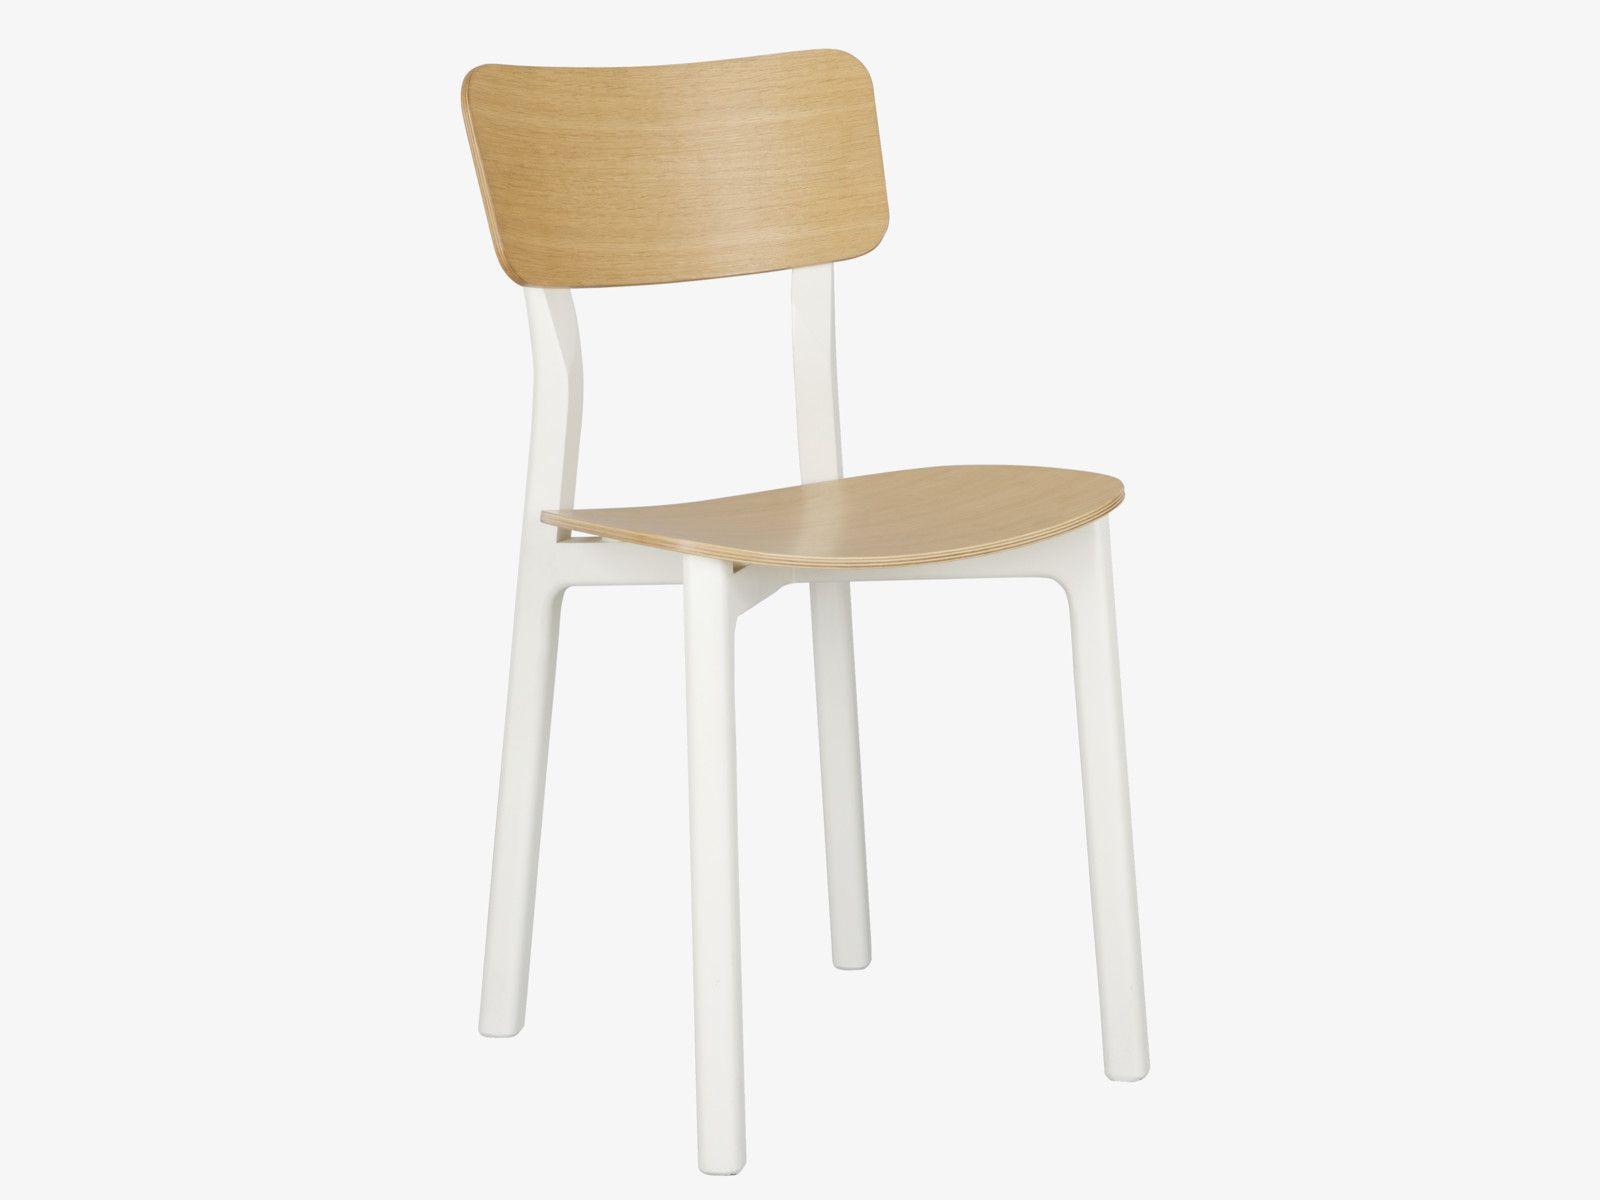 harrison wei holz stuhl esszimmer habitat st hle pinterest st hle esszimmer und. Black Bedroom Furniture Sets. Home Design Ideas